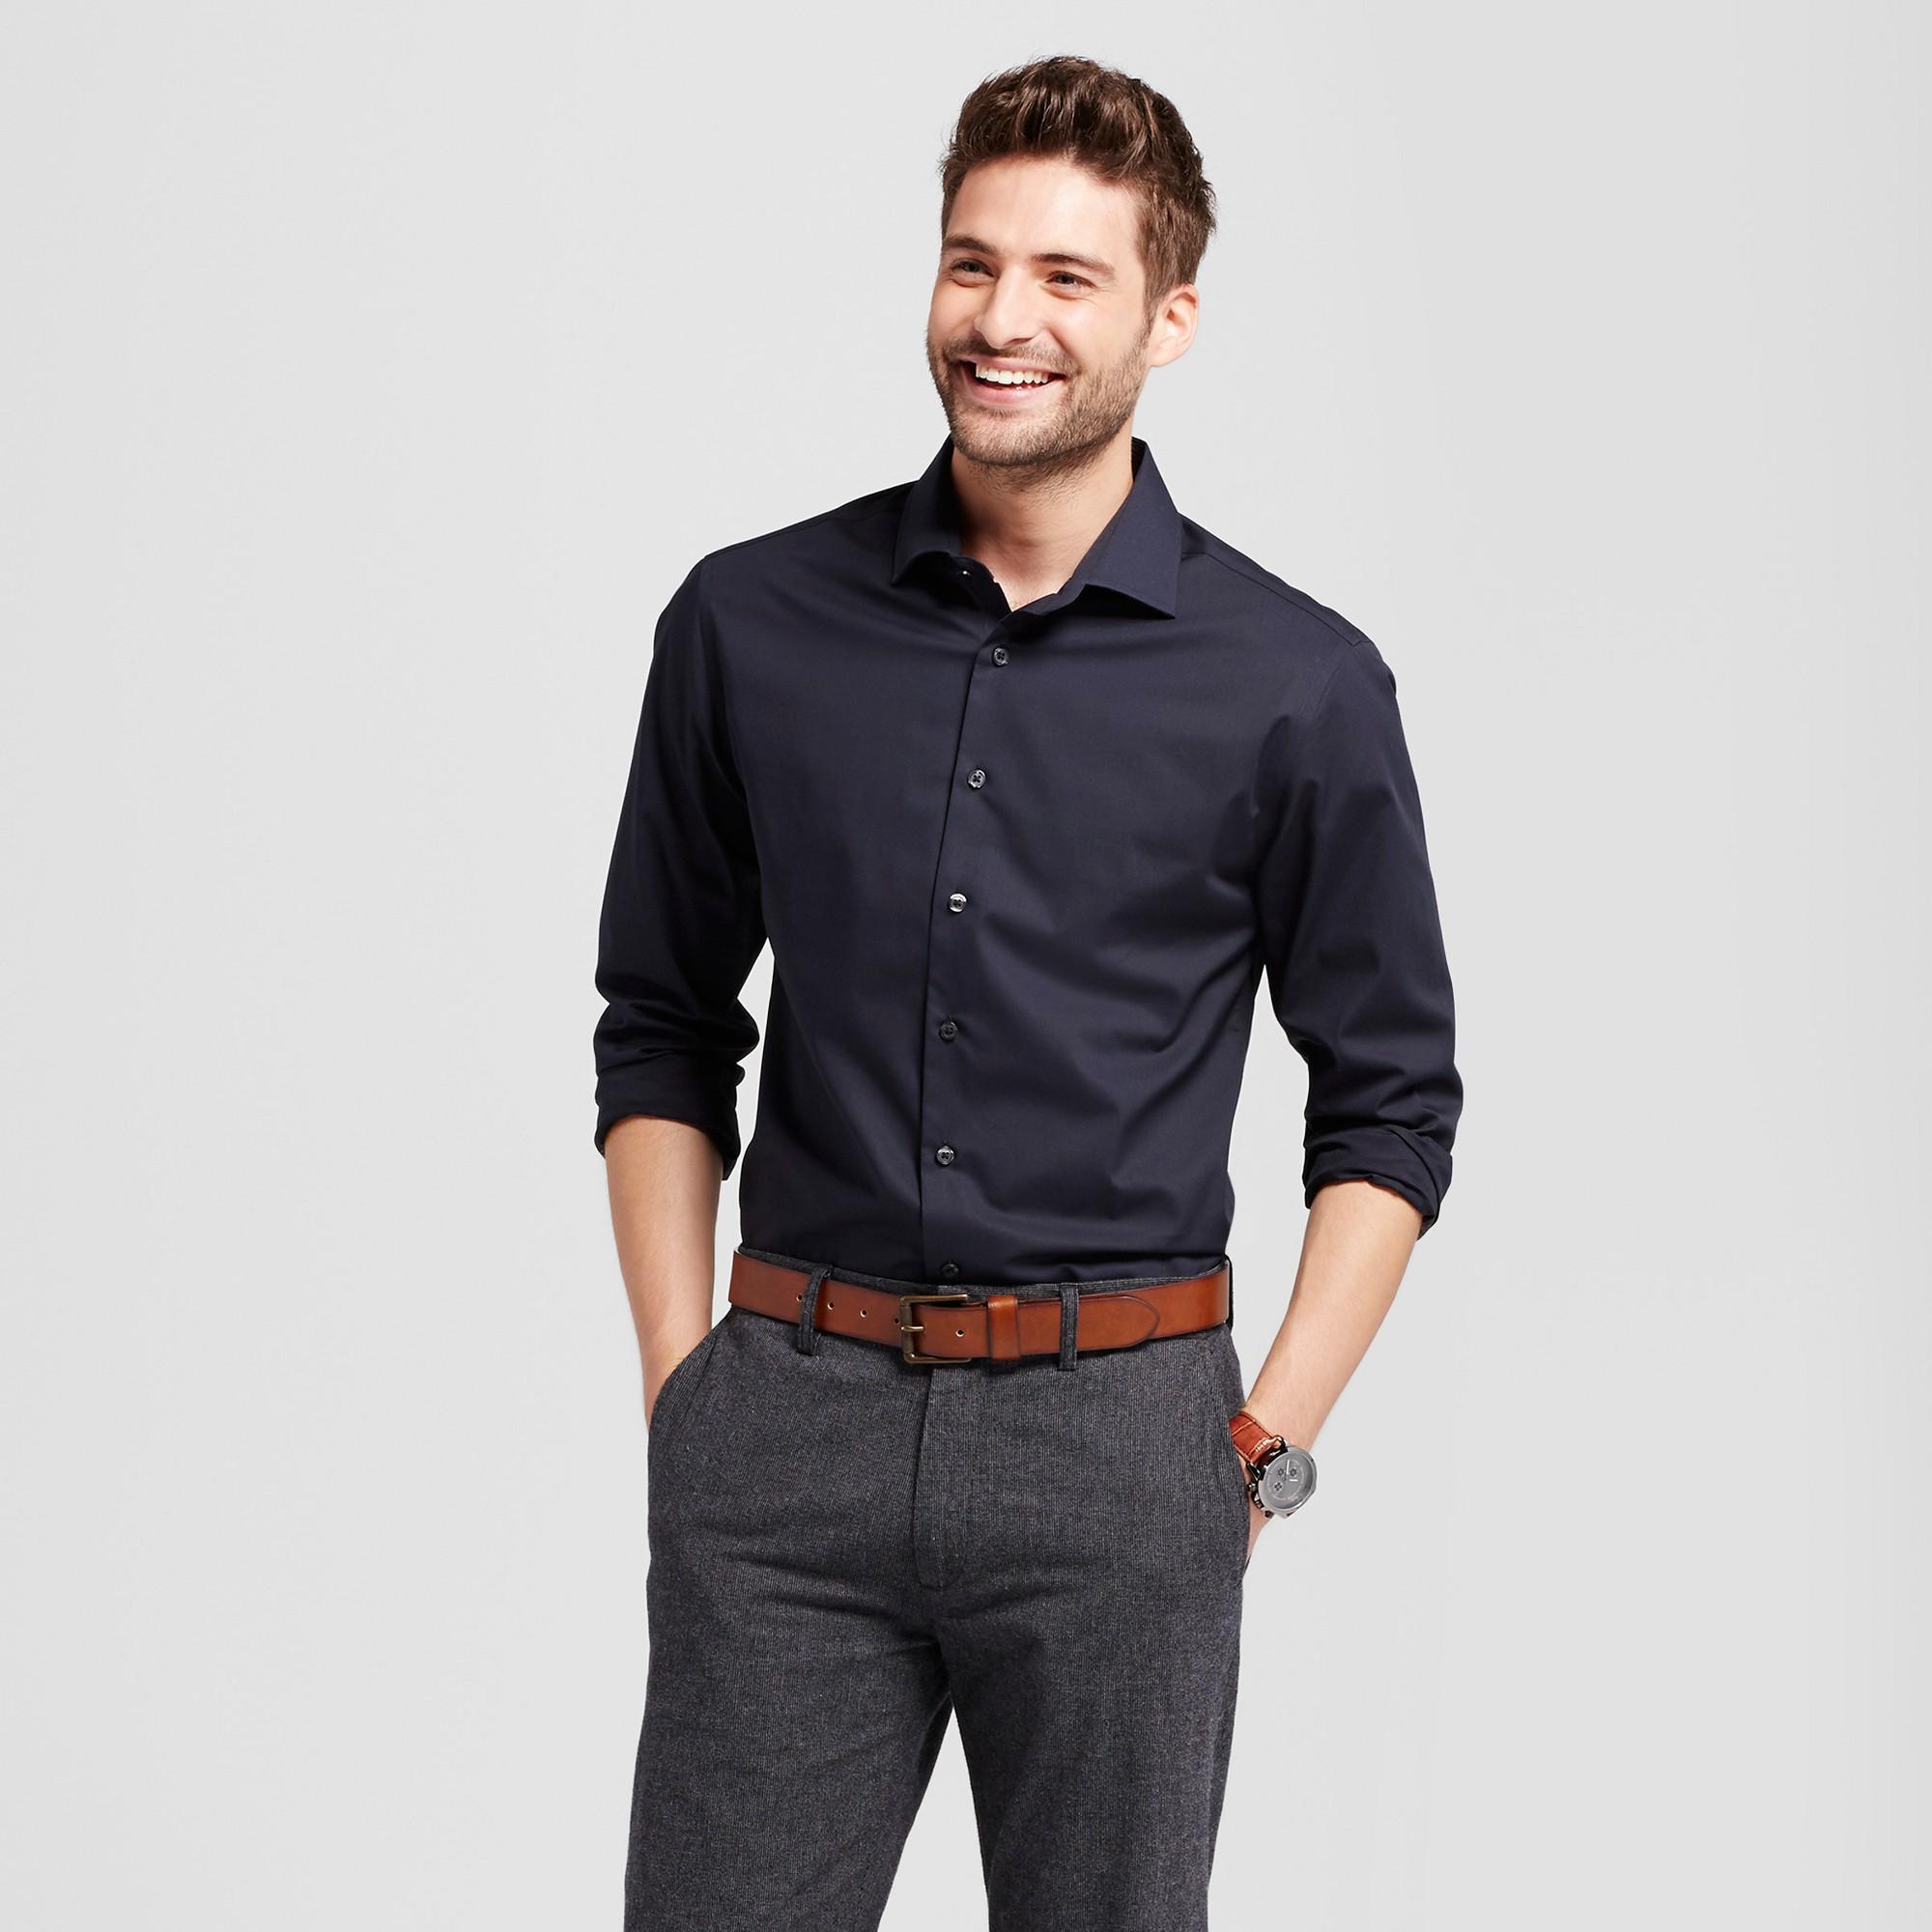 Men S Standard Fit Ultimate Button Down Dress Shirt Goodfellow Co Black Xxl Black Shirt Outfit Men Shirt Outfit Men Mens Shirt Dress [ 2000 x 2000 Pixel ]